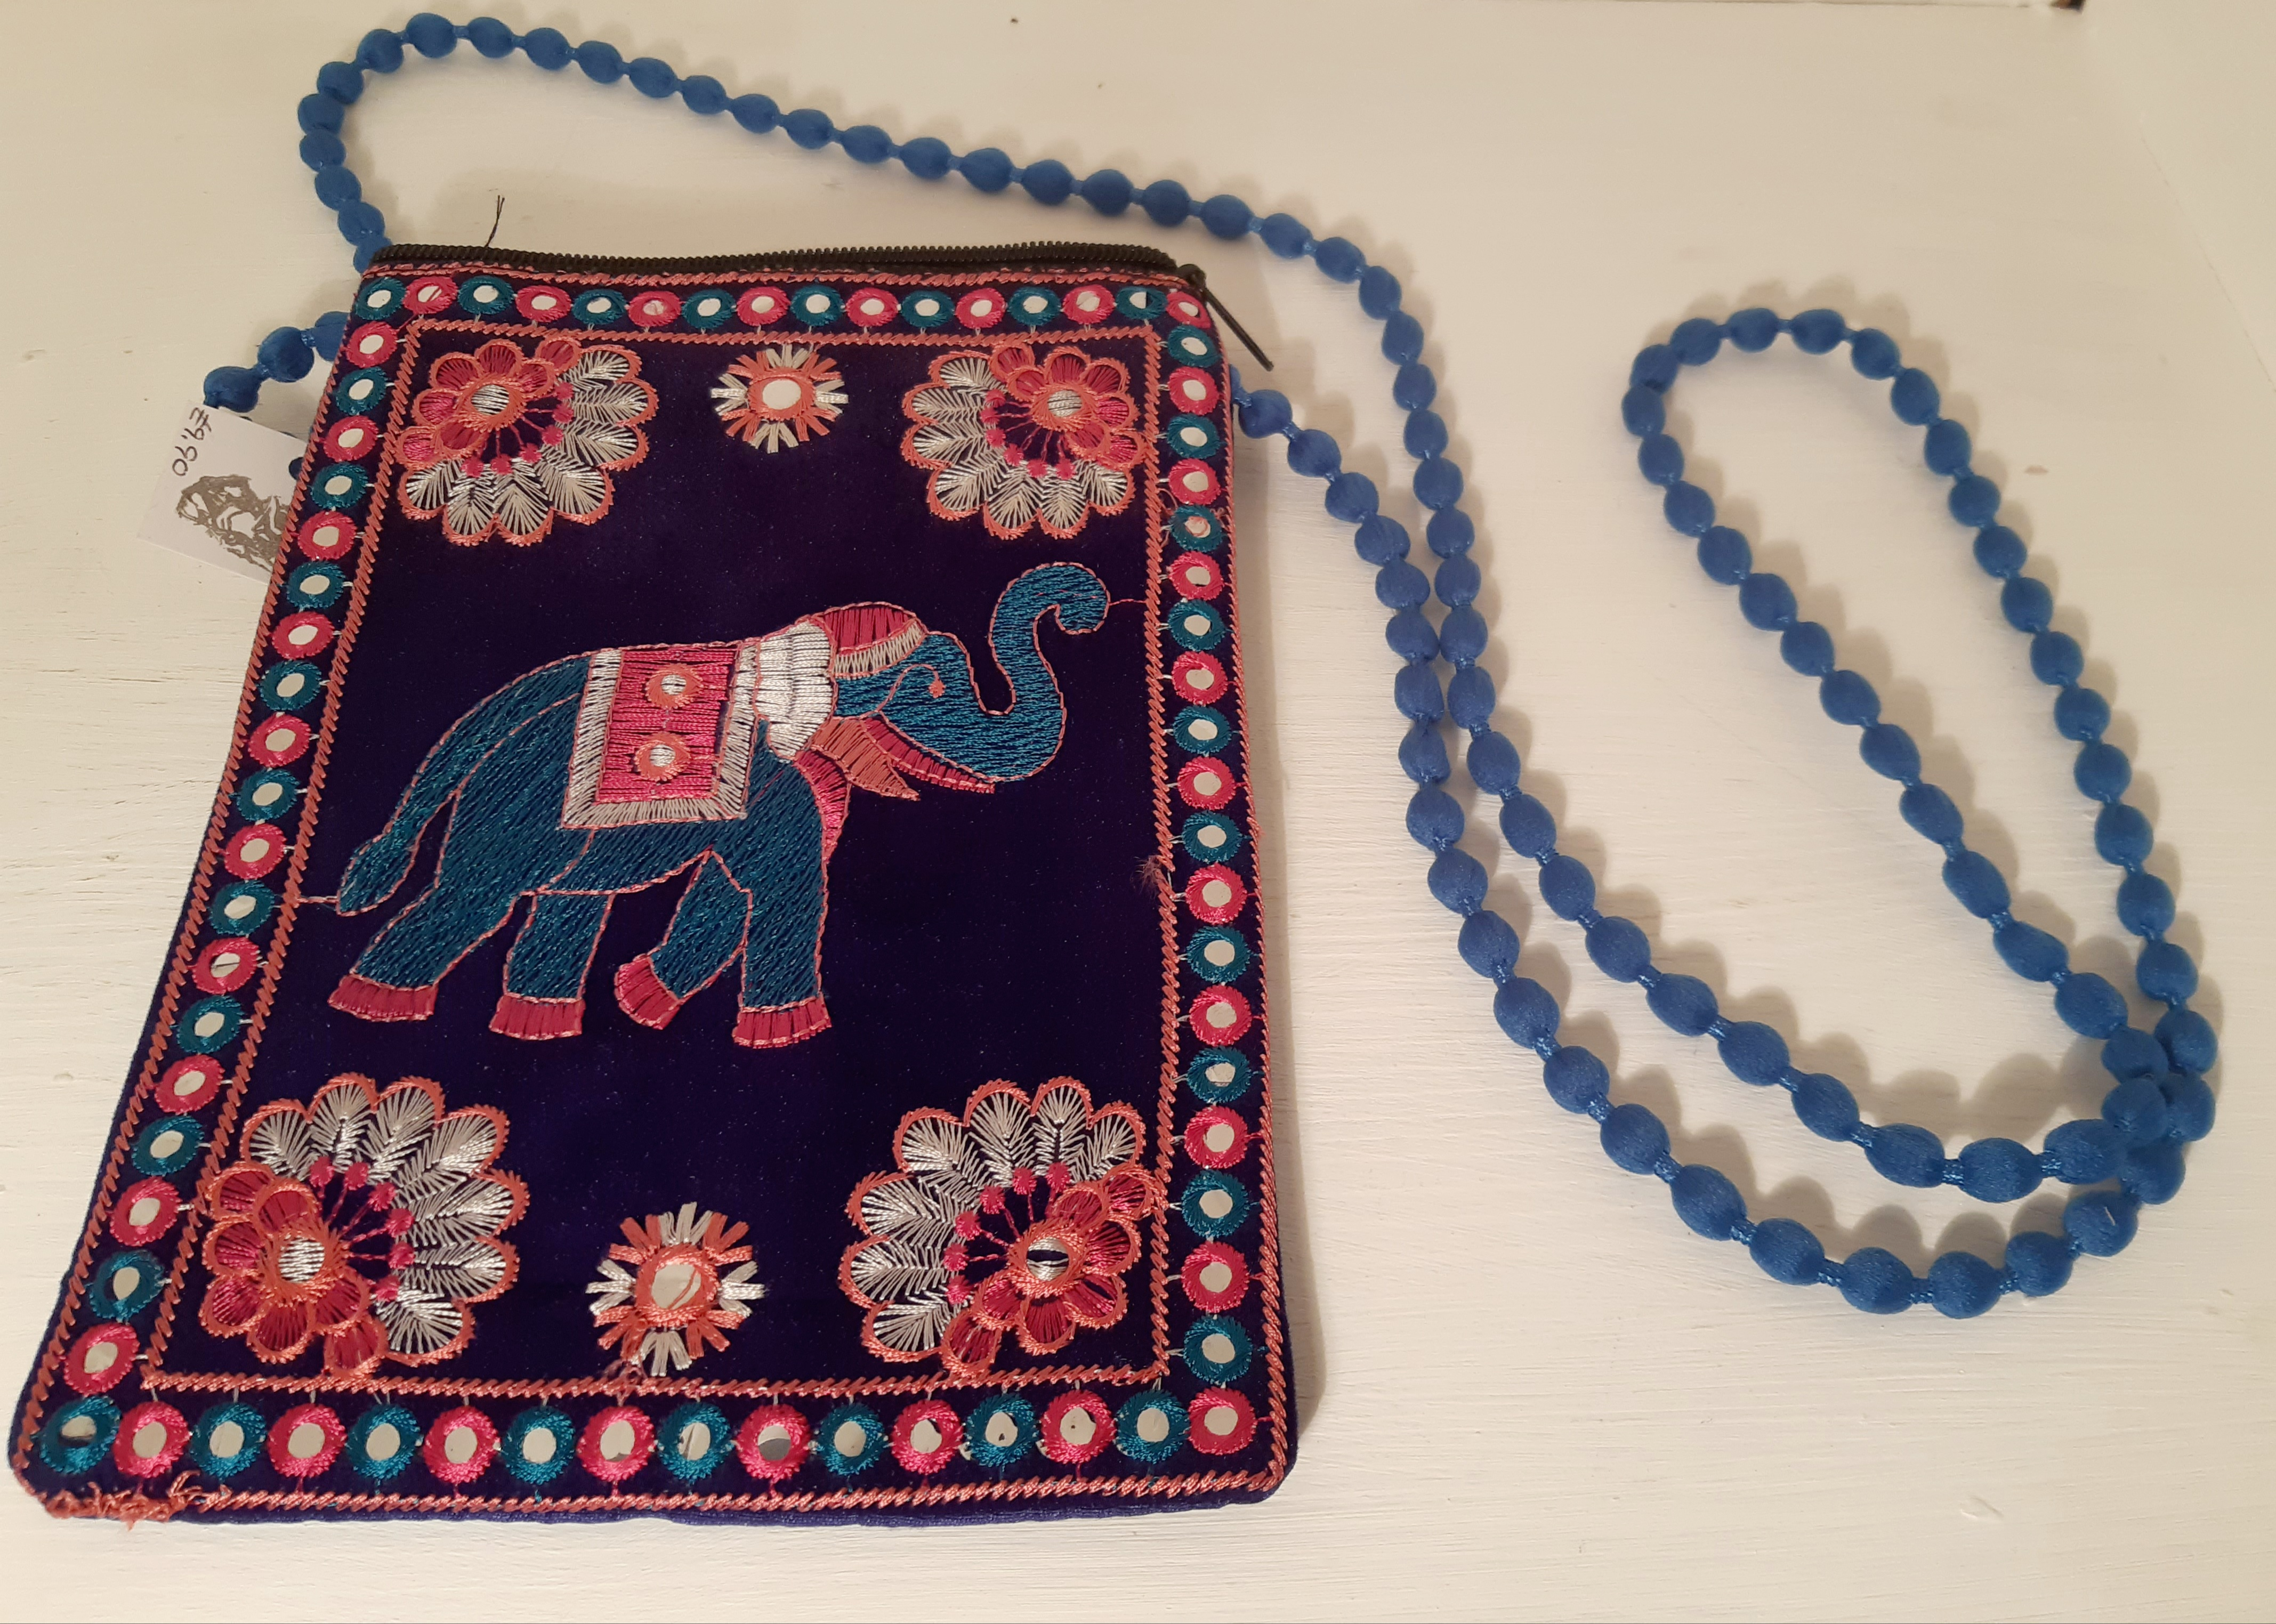 Indian handbag